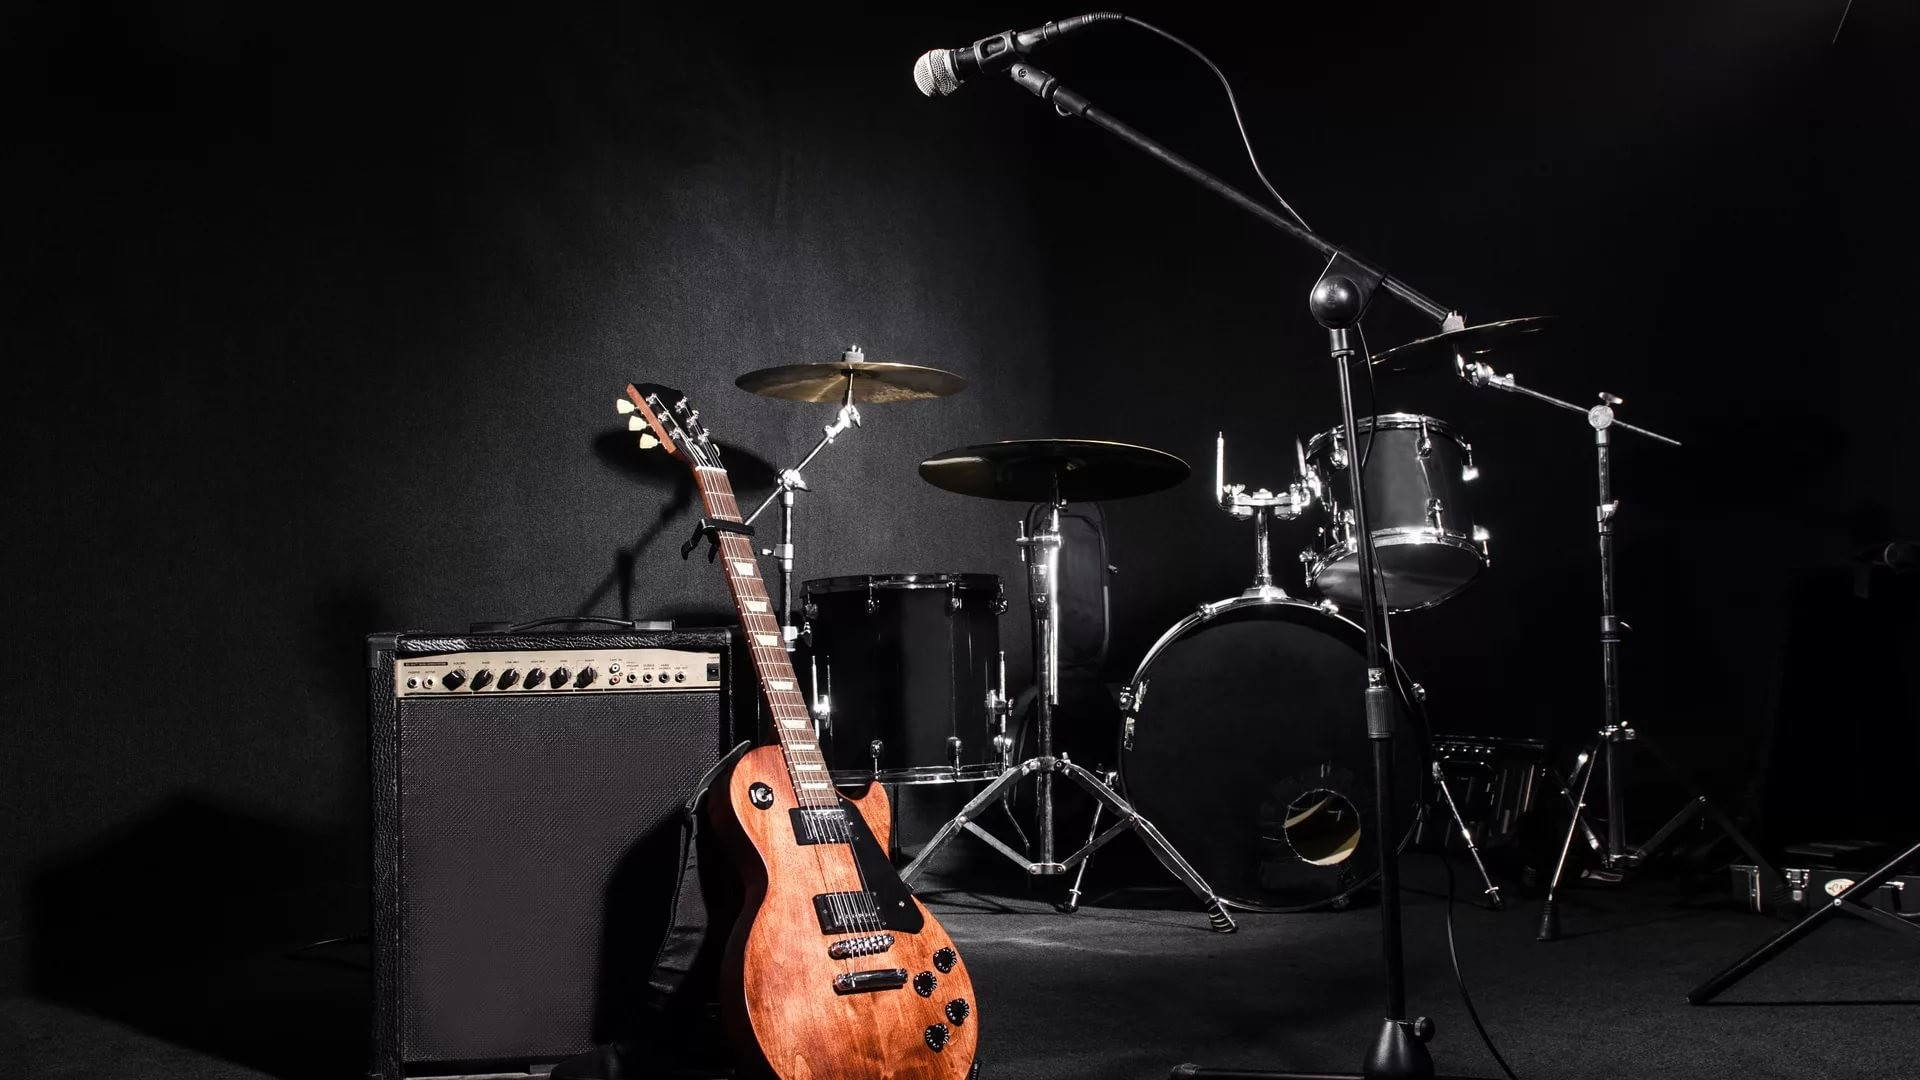 1920x1080, Herunterladen - Set Of Musical Instruments , HD Wallpaper & Backgrounds